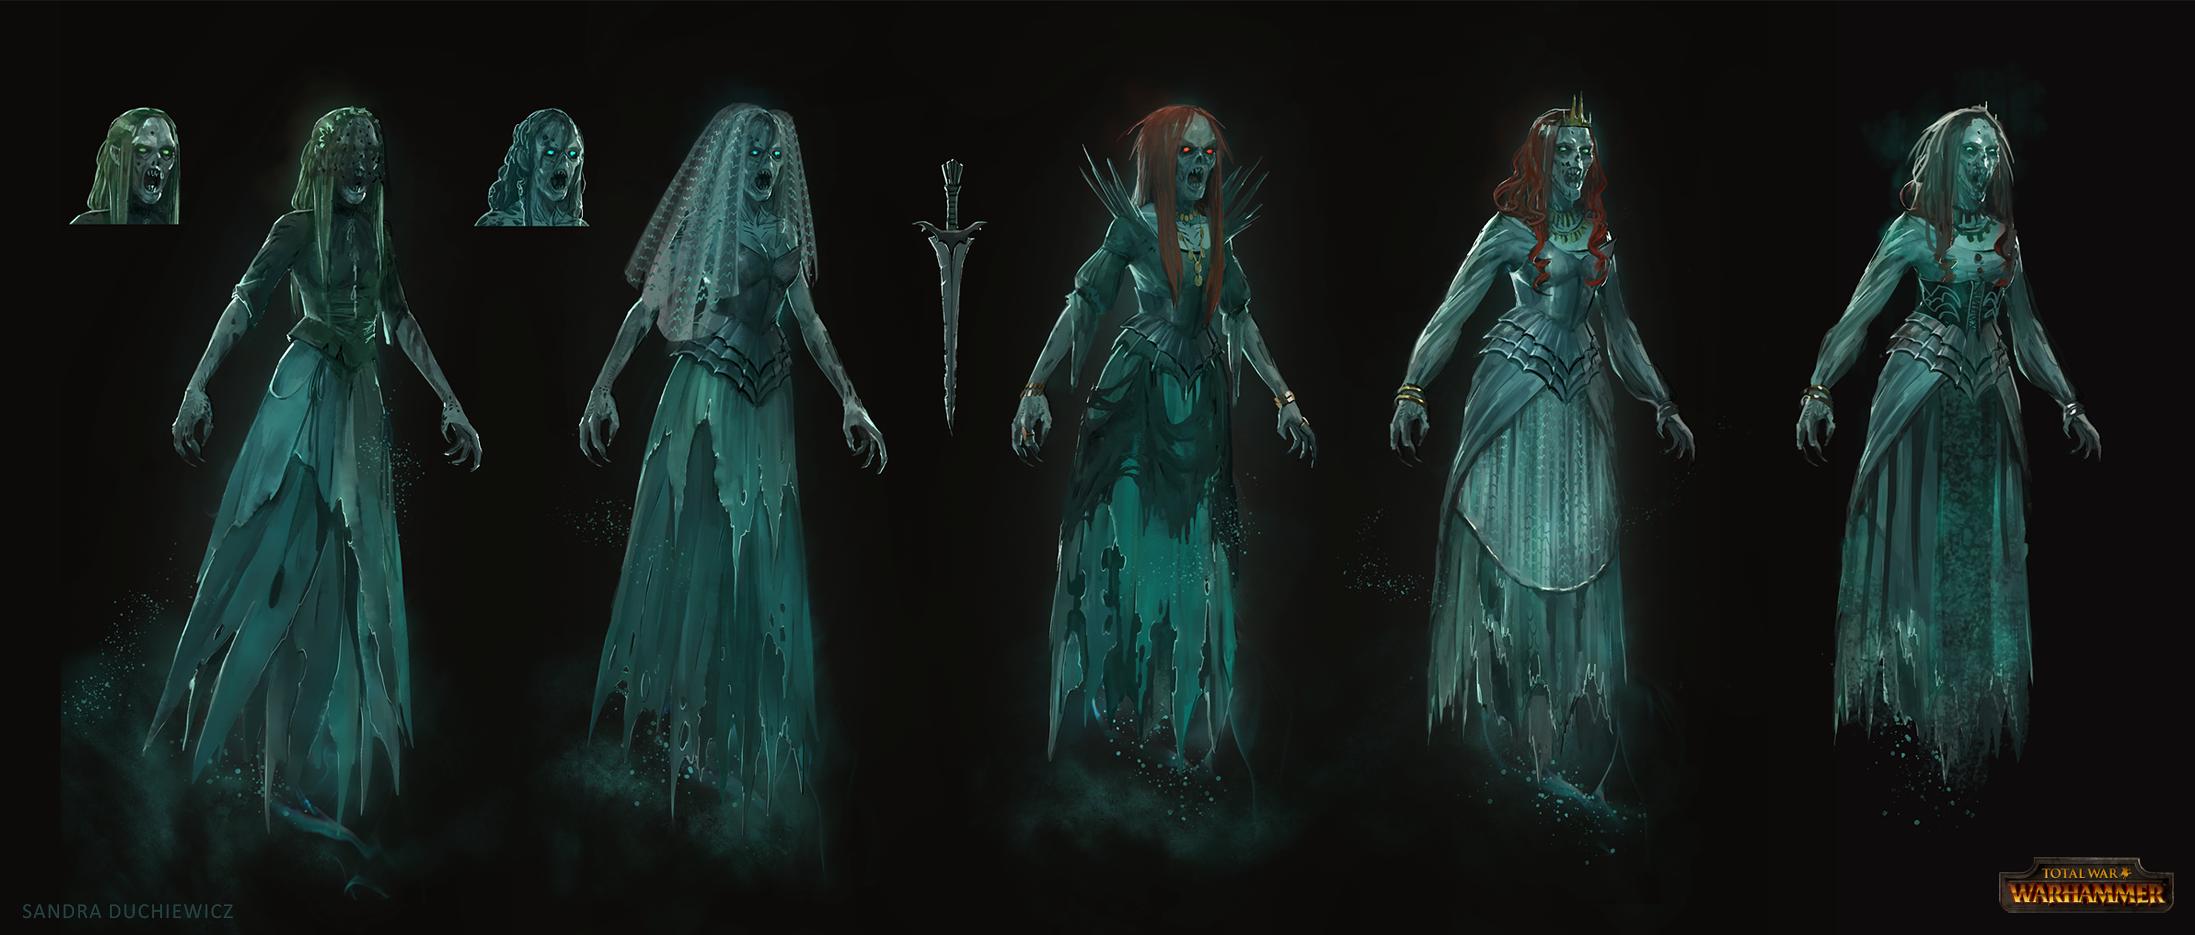 Total War: Warhammer Concept Art - Banshee by telthona